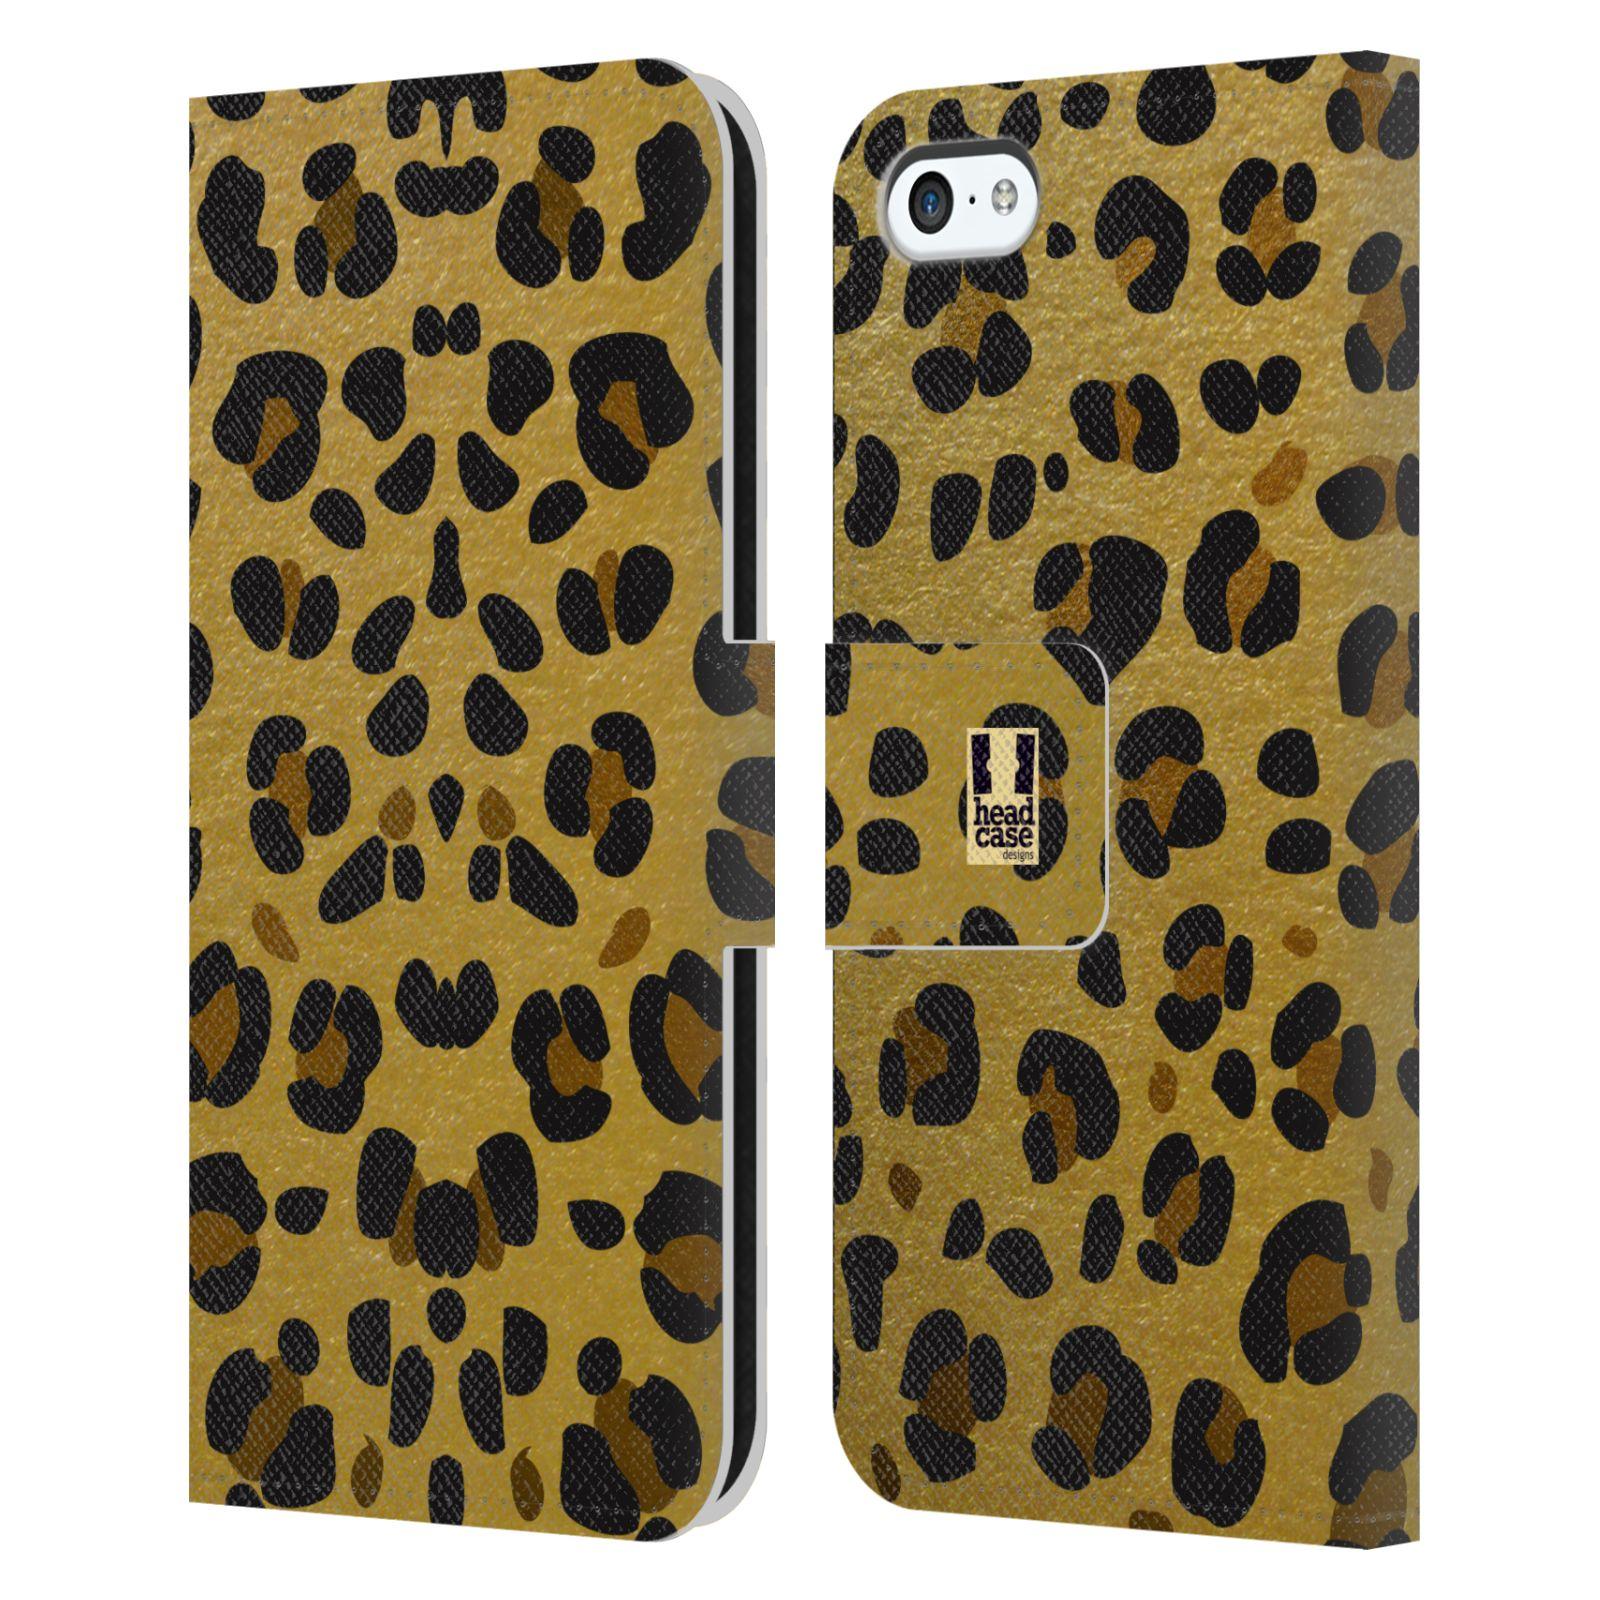 Pouzdro na mobil Apple Iphone 5C - Head Case - Fashion zvířecí vzor